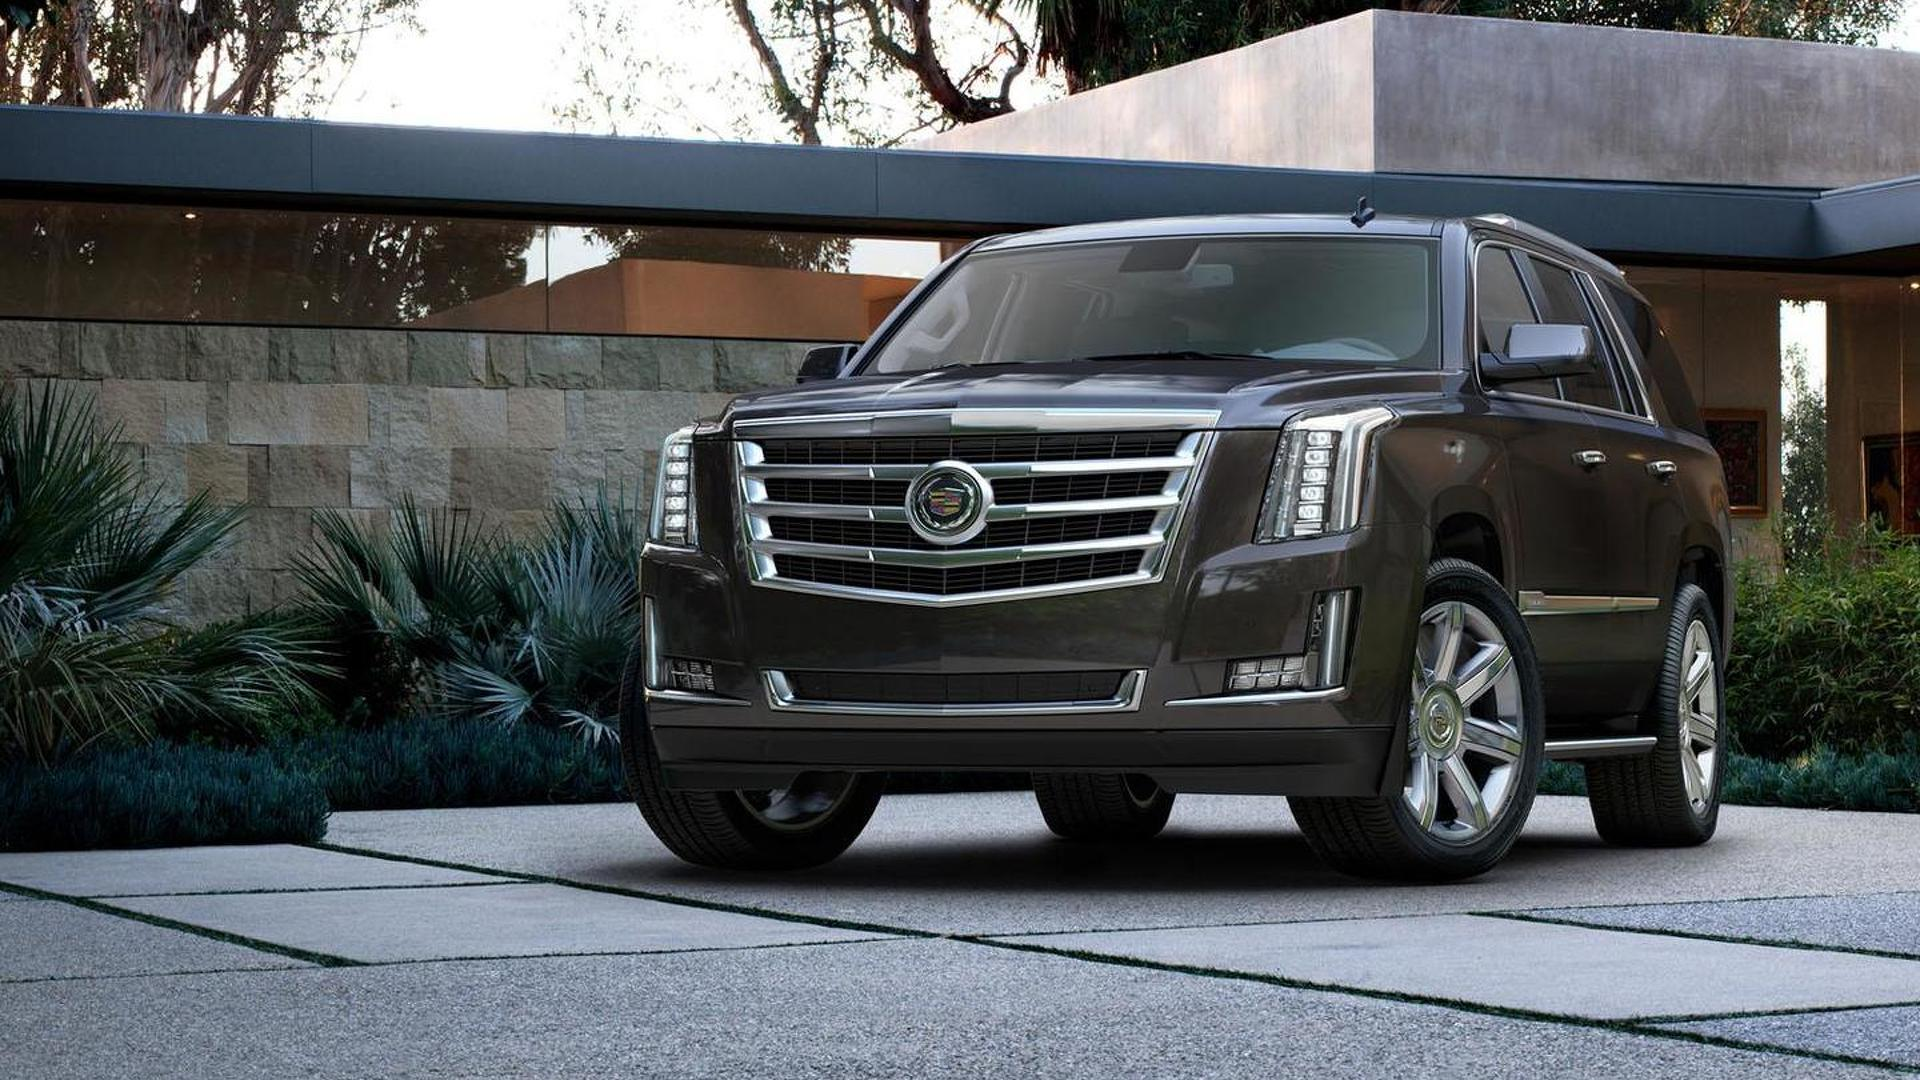 Cadillac considering an ultra-luxury Escalade